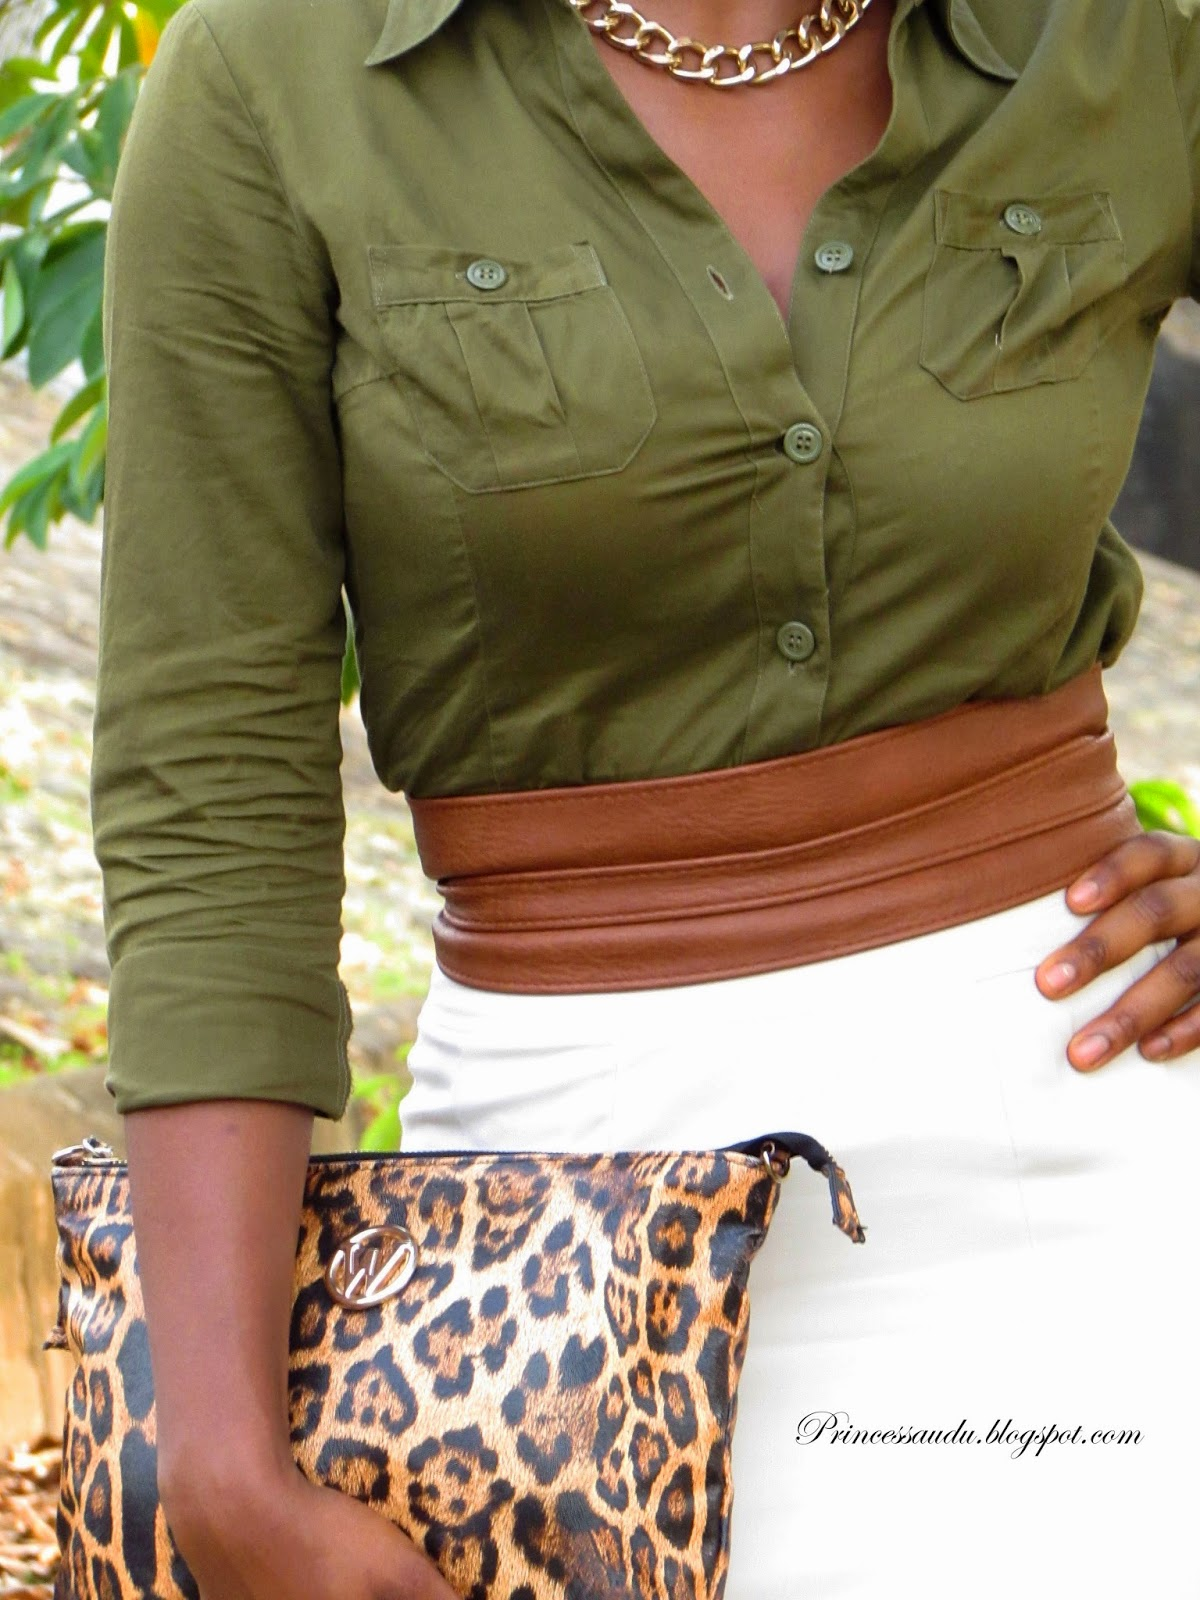 beige pencil skirt, Zara nude ankle strap sandals, khaki,leopard print clutch, army green shirt